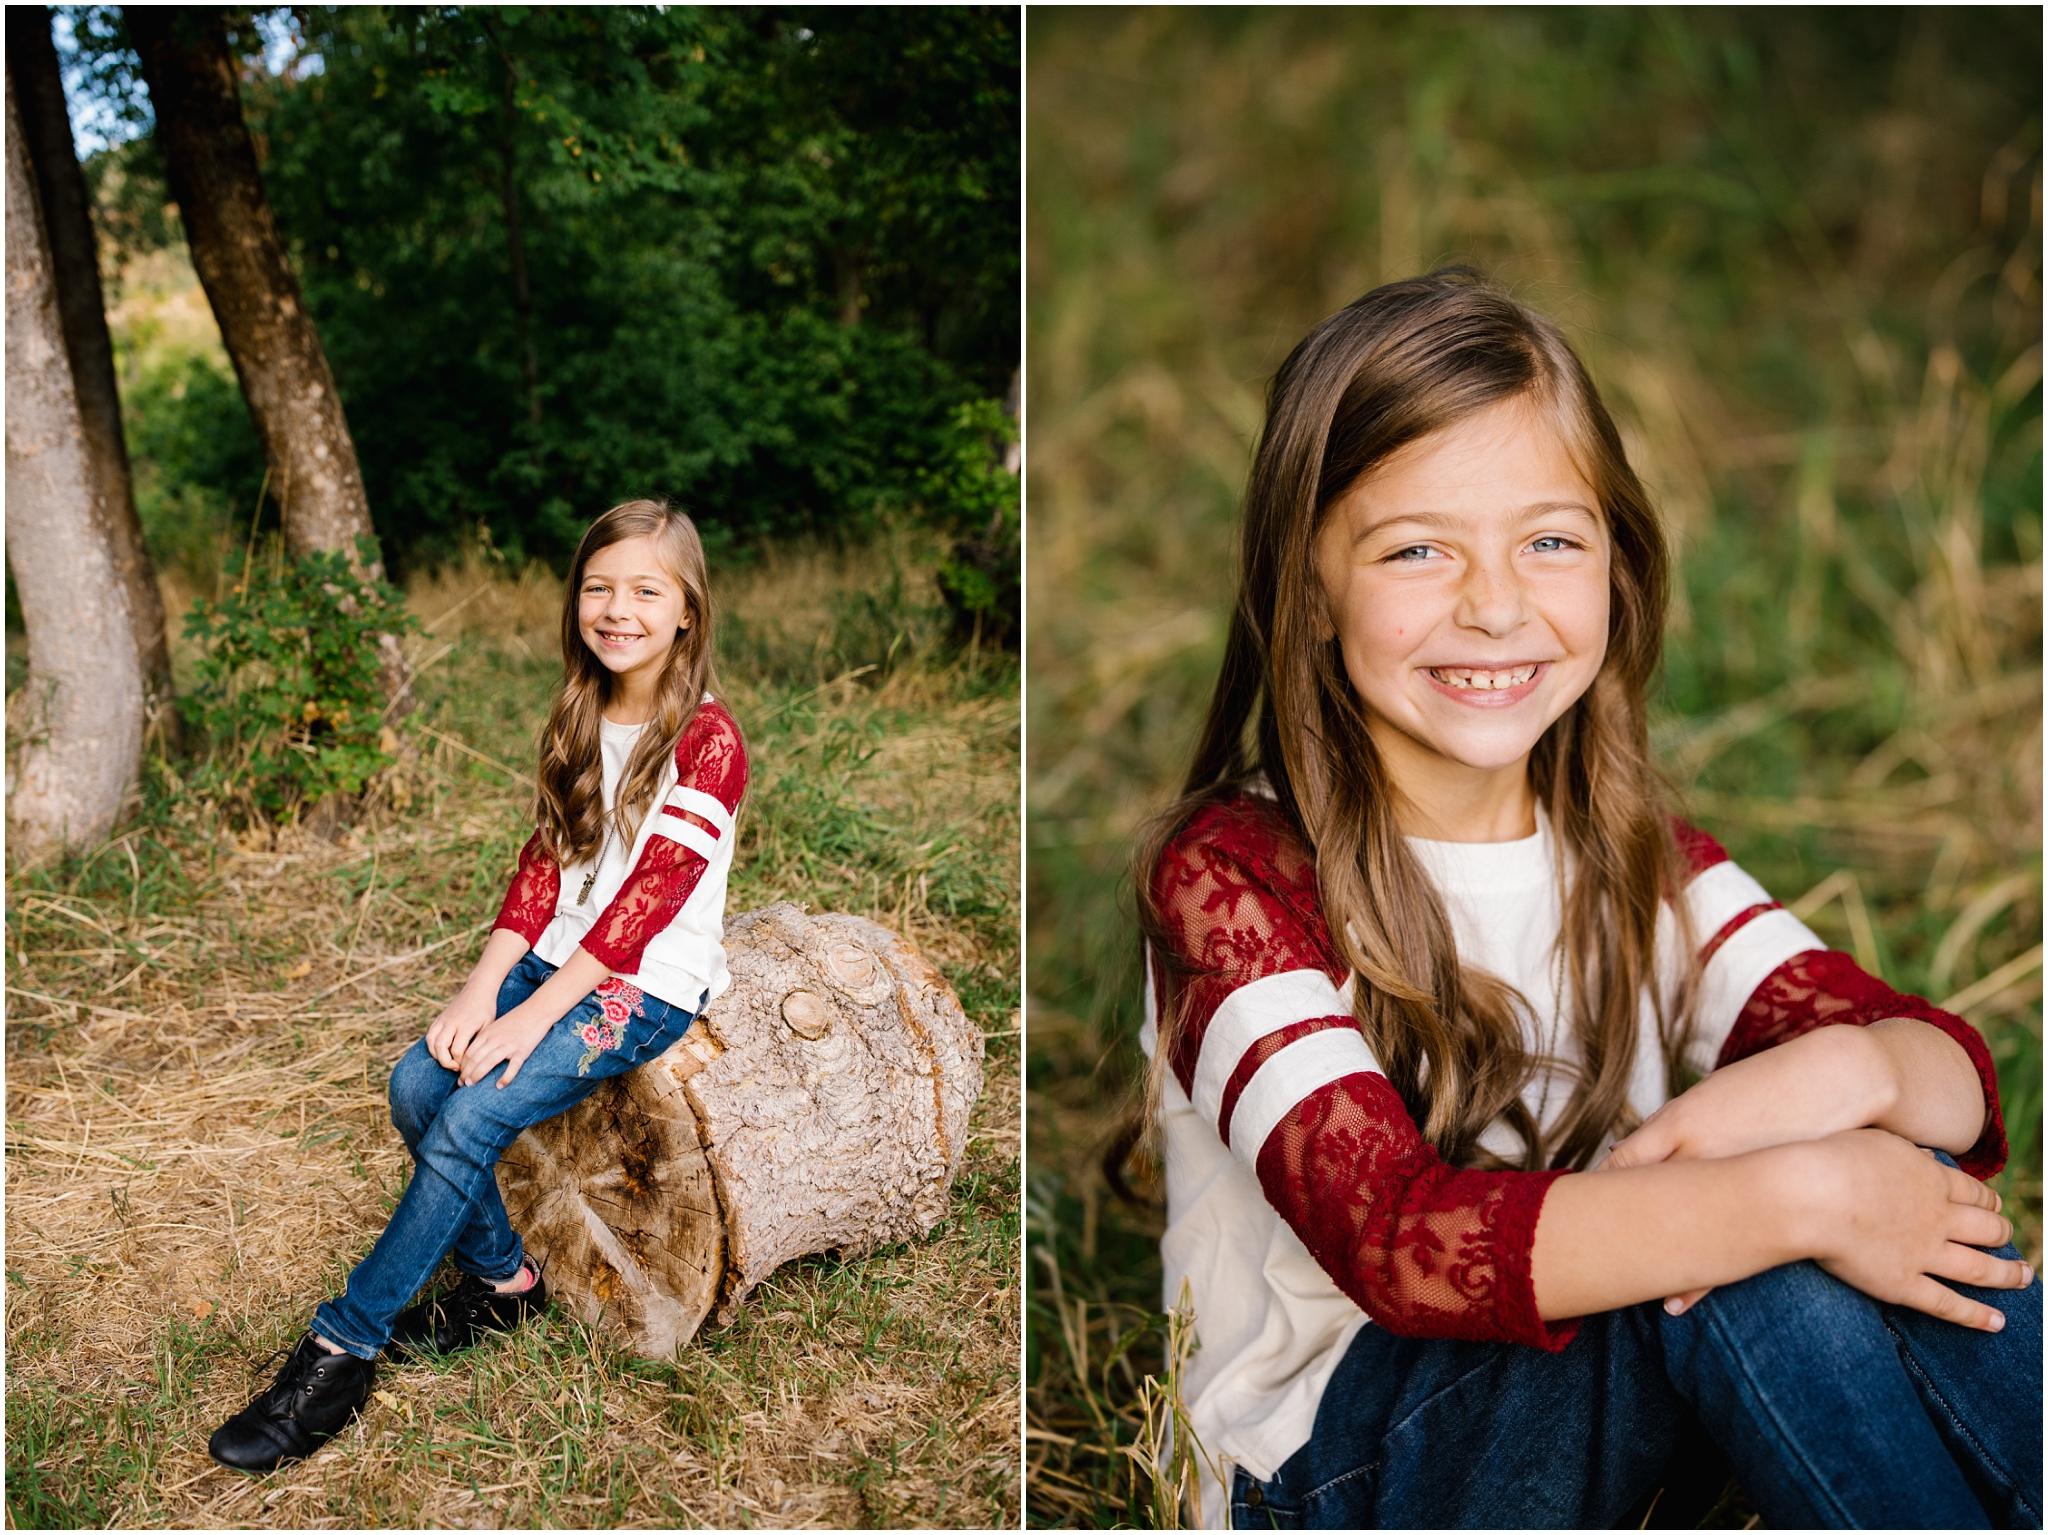 Hurst-18_Lizzie-B-Imagery-Utah-Family-Photographer-Hobble-Creek-Canyon-Jolleys-Ranch-Utah-County.jpg